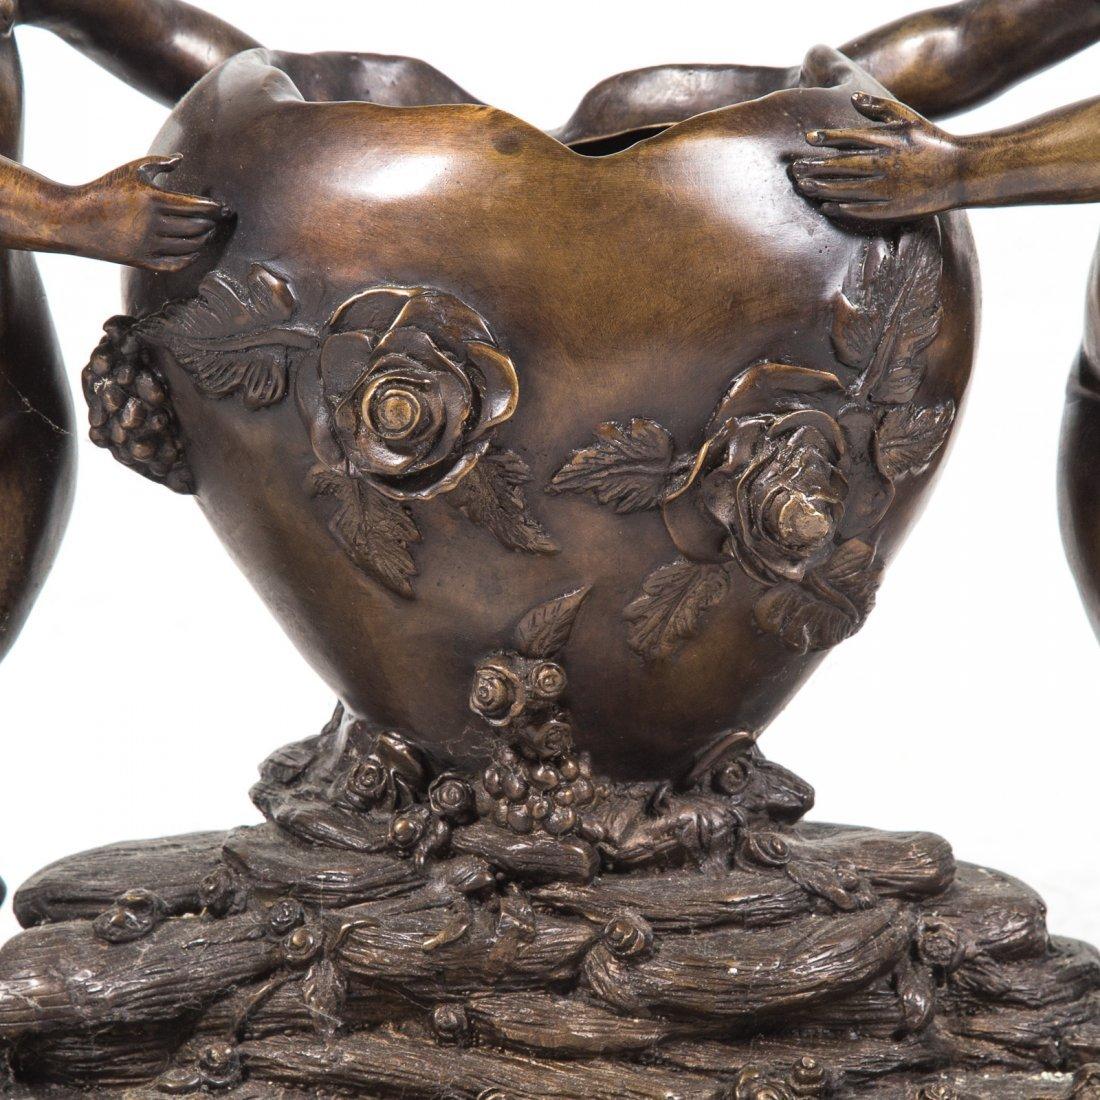 Louis XVI style bronze figural planter - 2